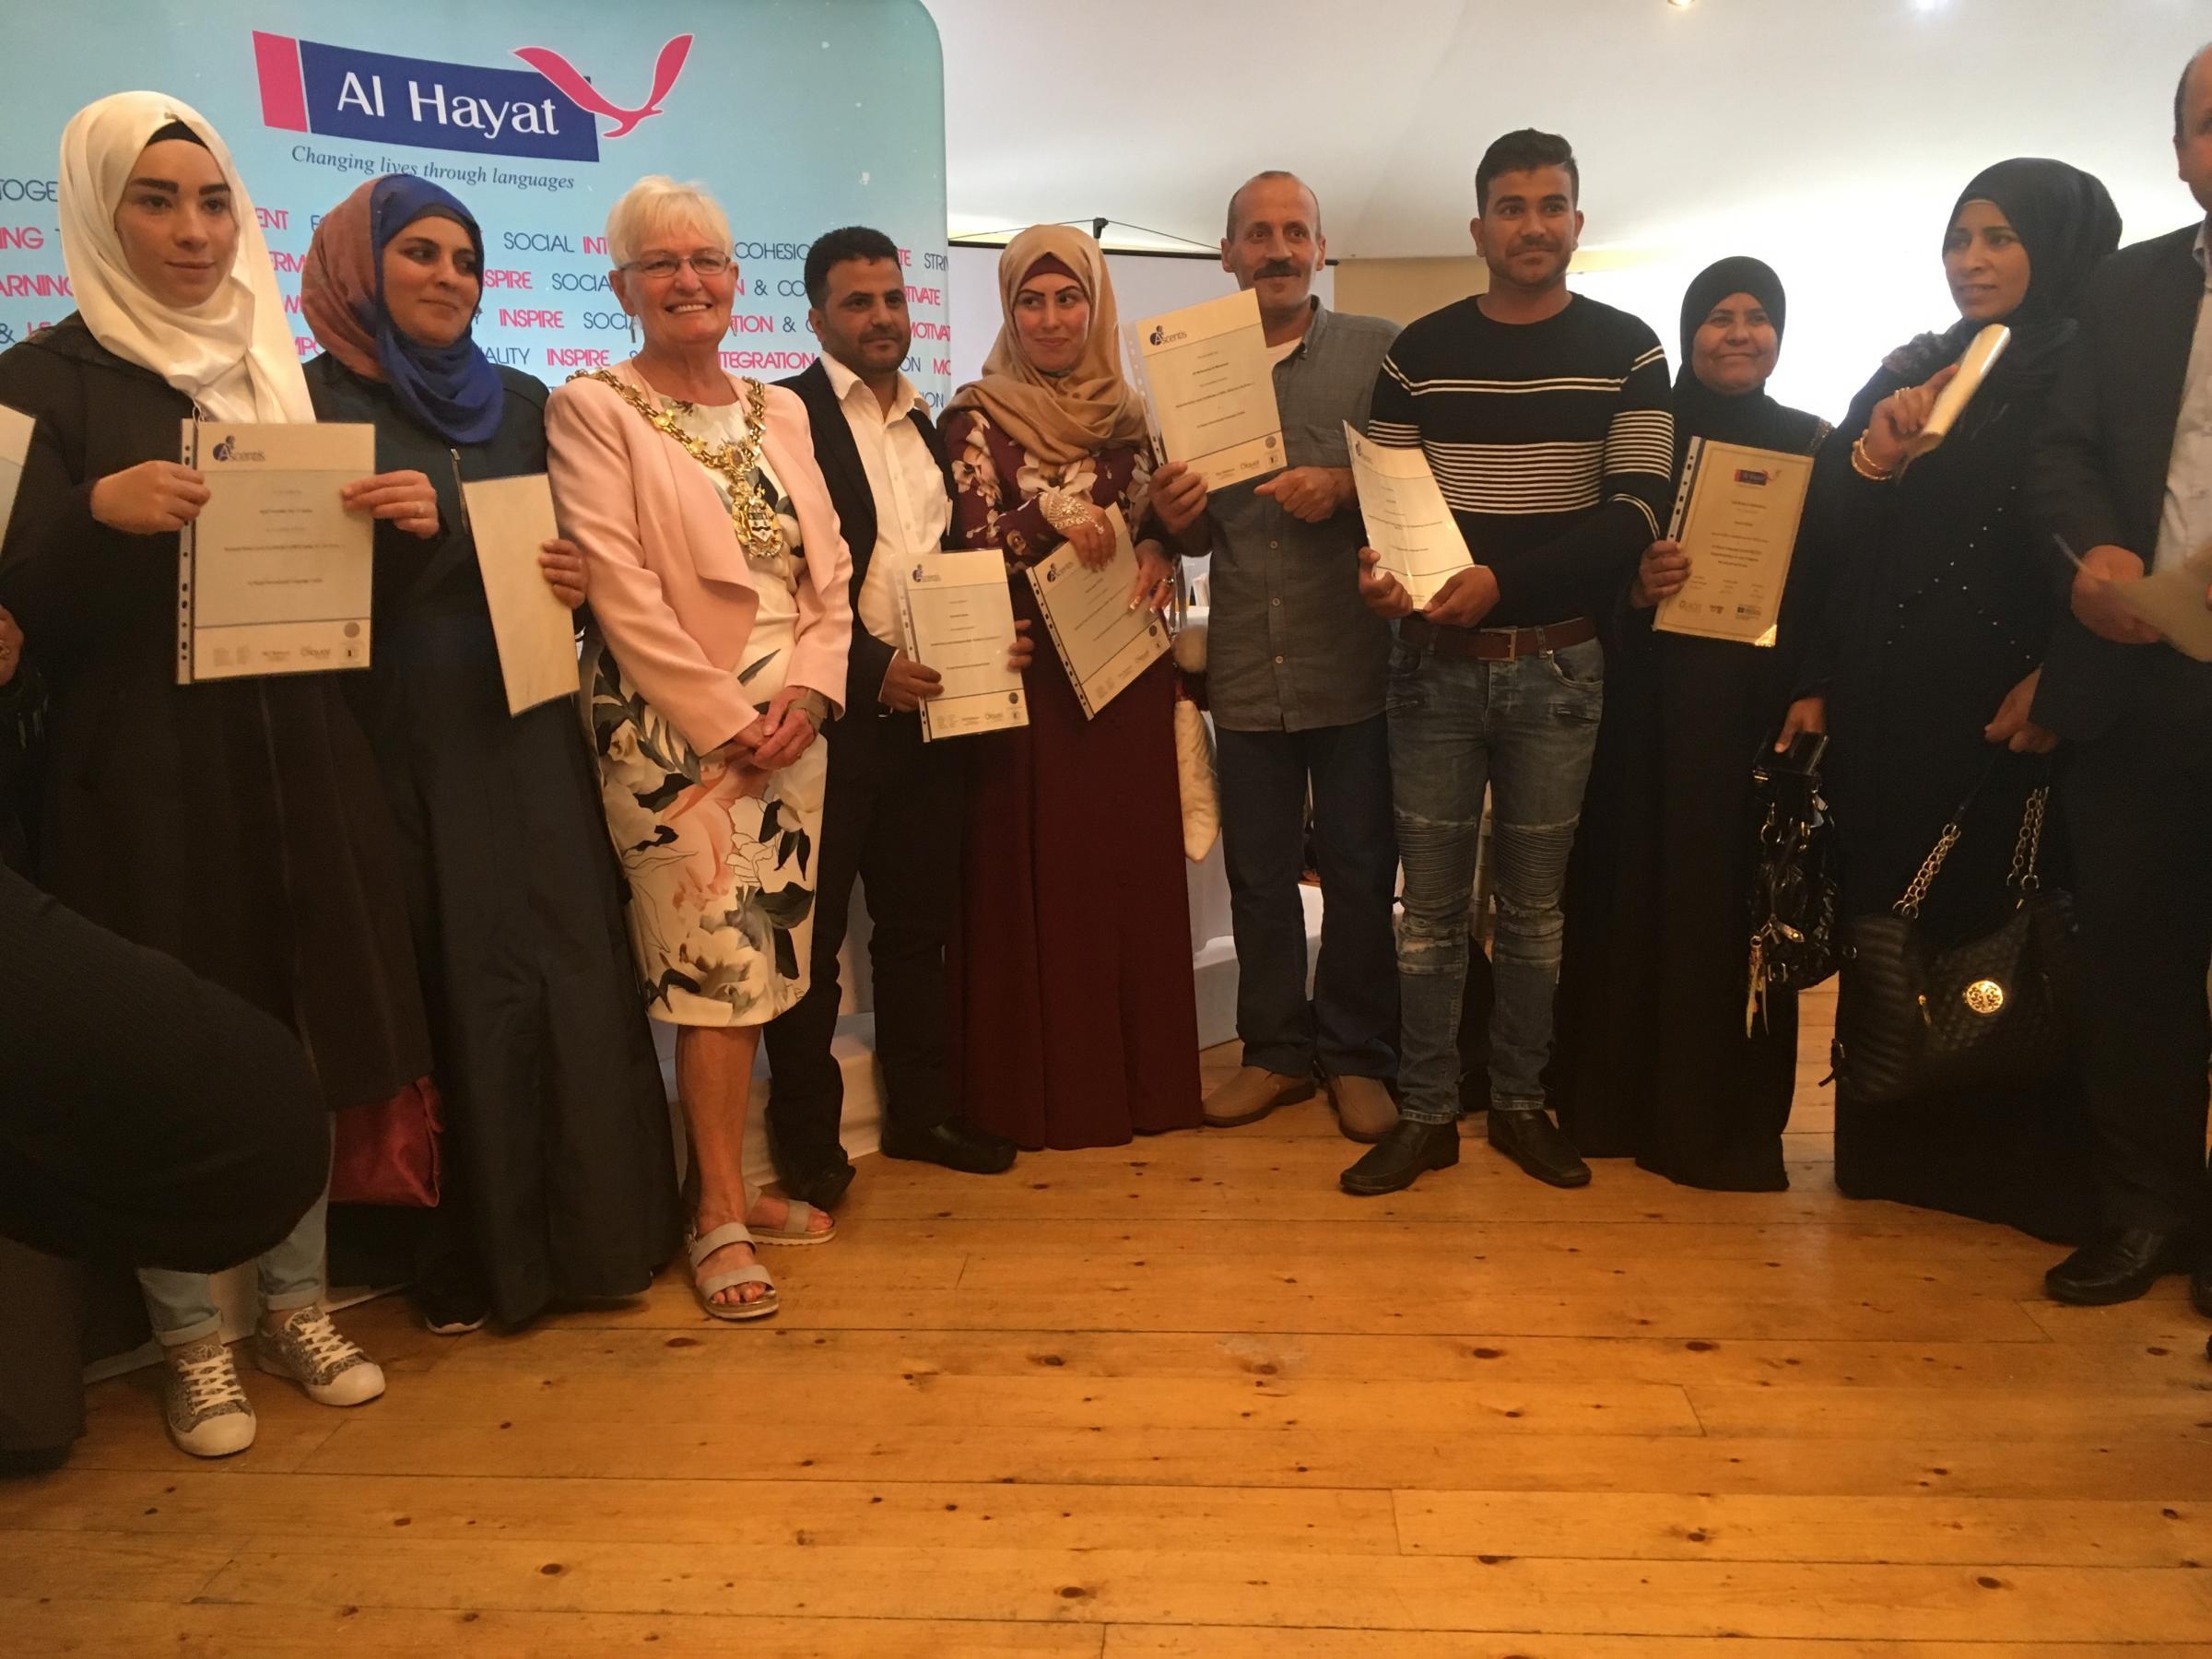 Al Hayat celebrating diversity and social integration